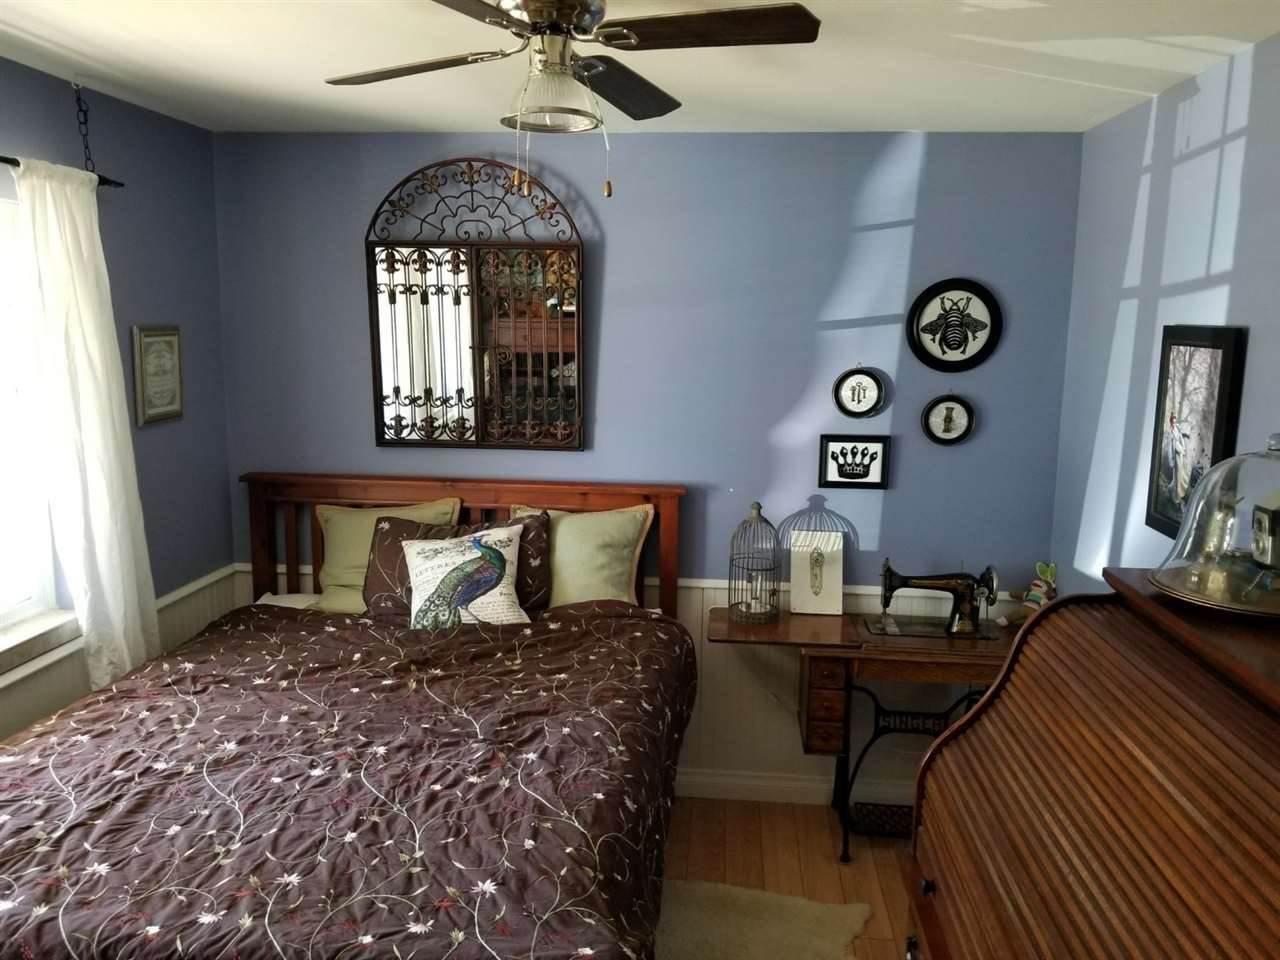 Photo 8: Photos: 5664 TRIDENT Avenue in Sechelt: Sechelt District House for sale (Sunshine Coast)  : MLS®# R2370476